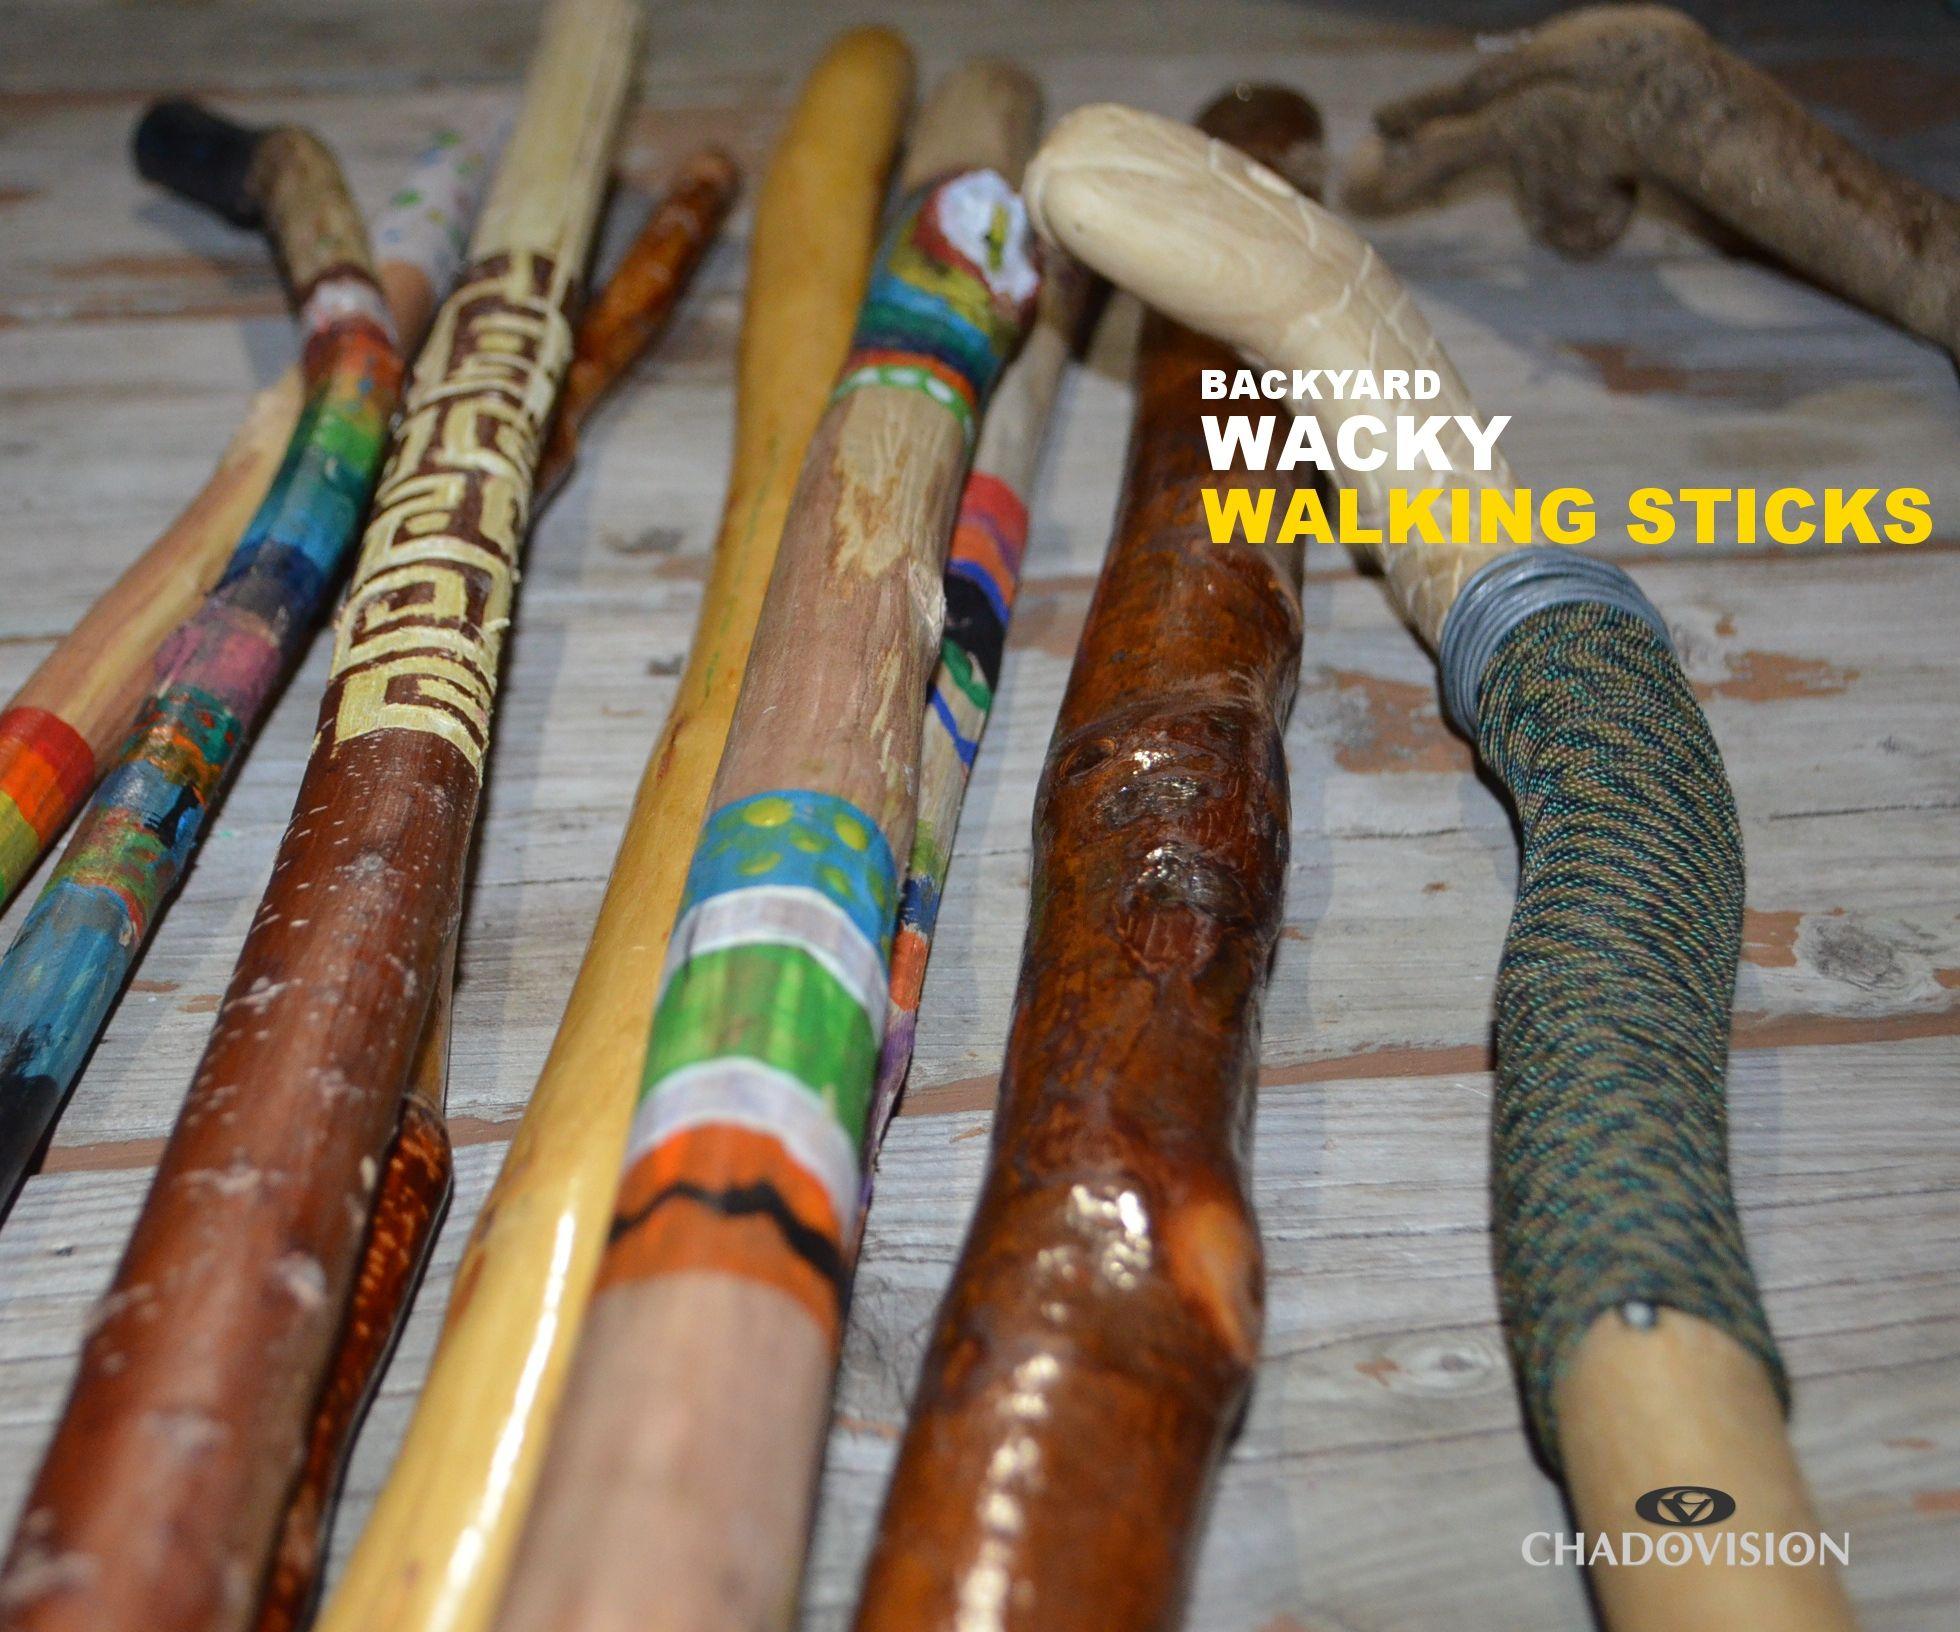 Wacky Walking Sticks